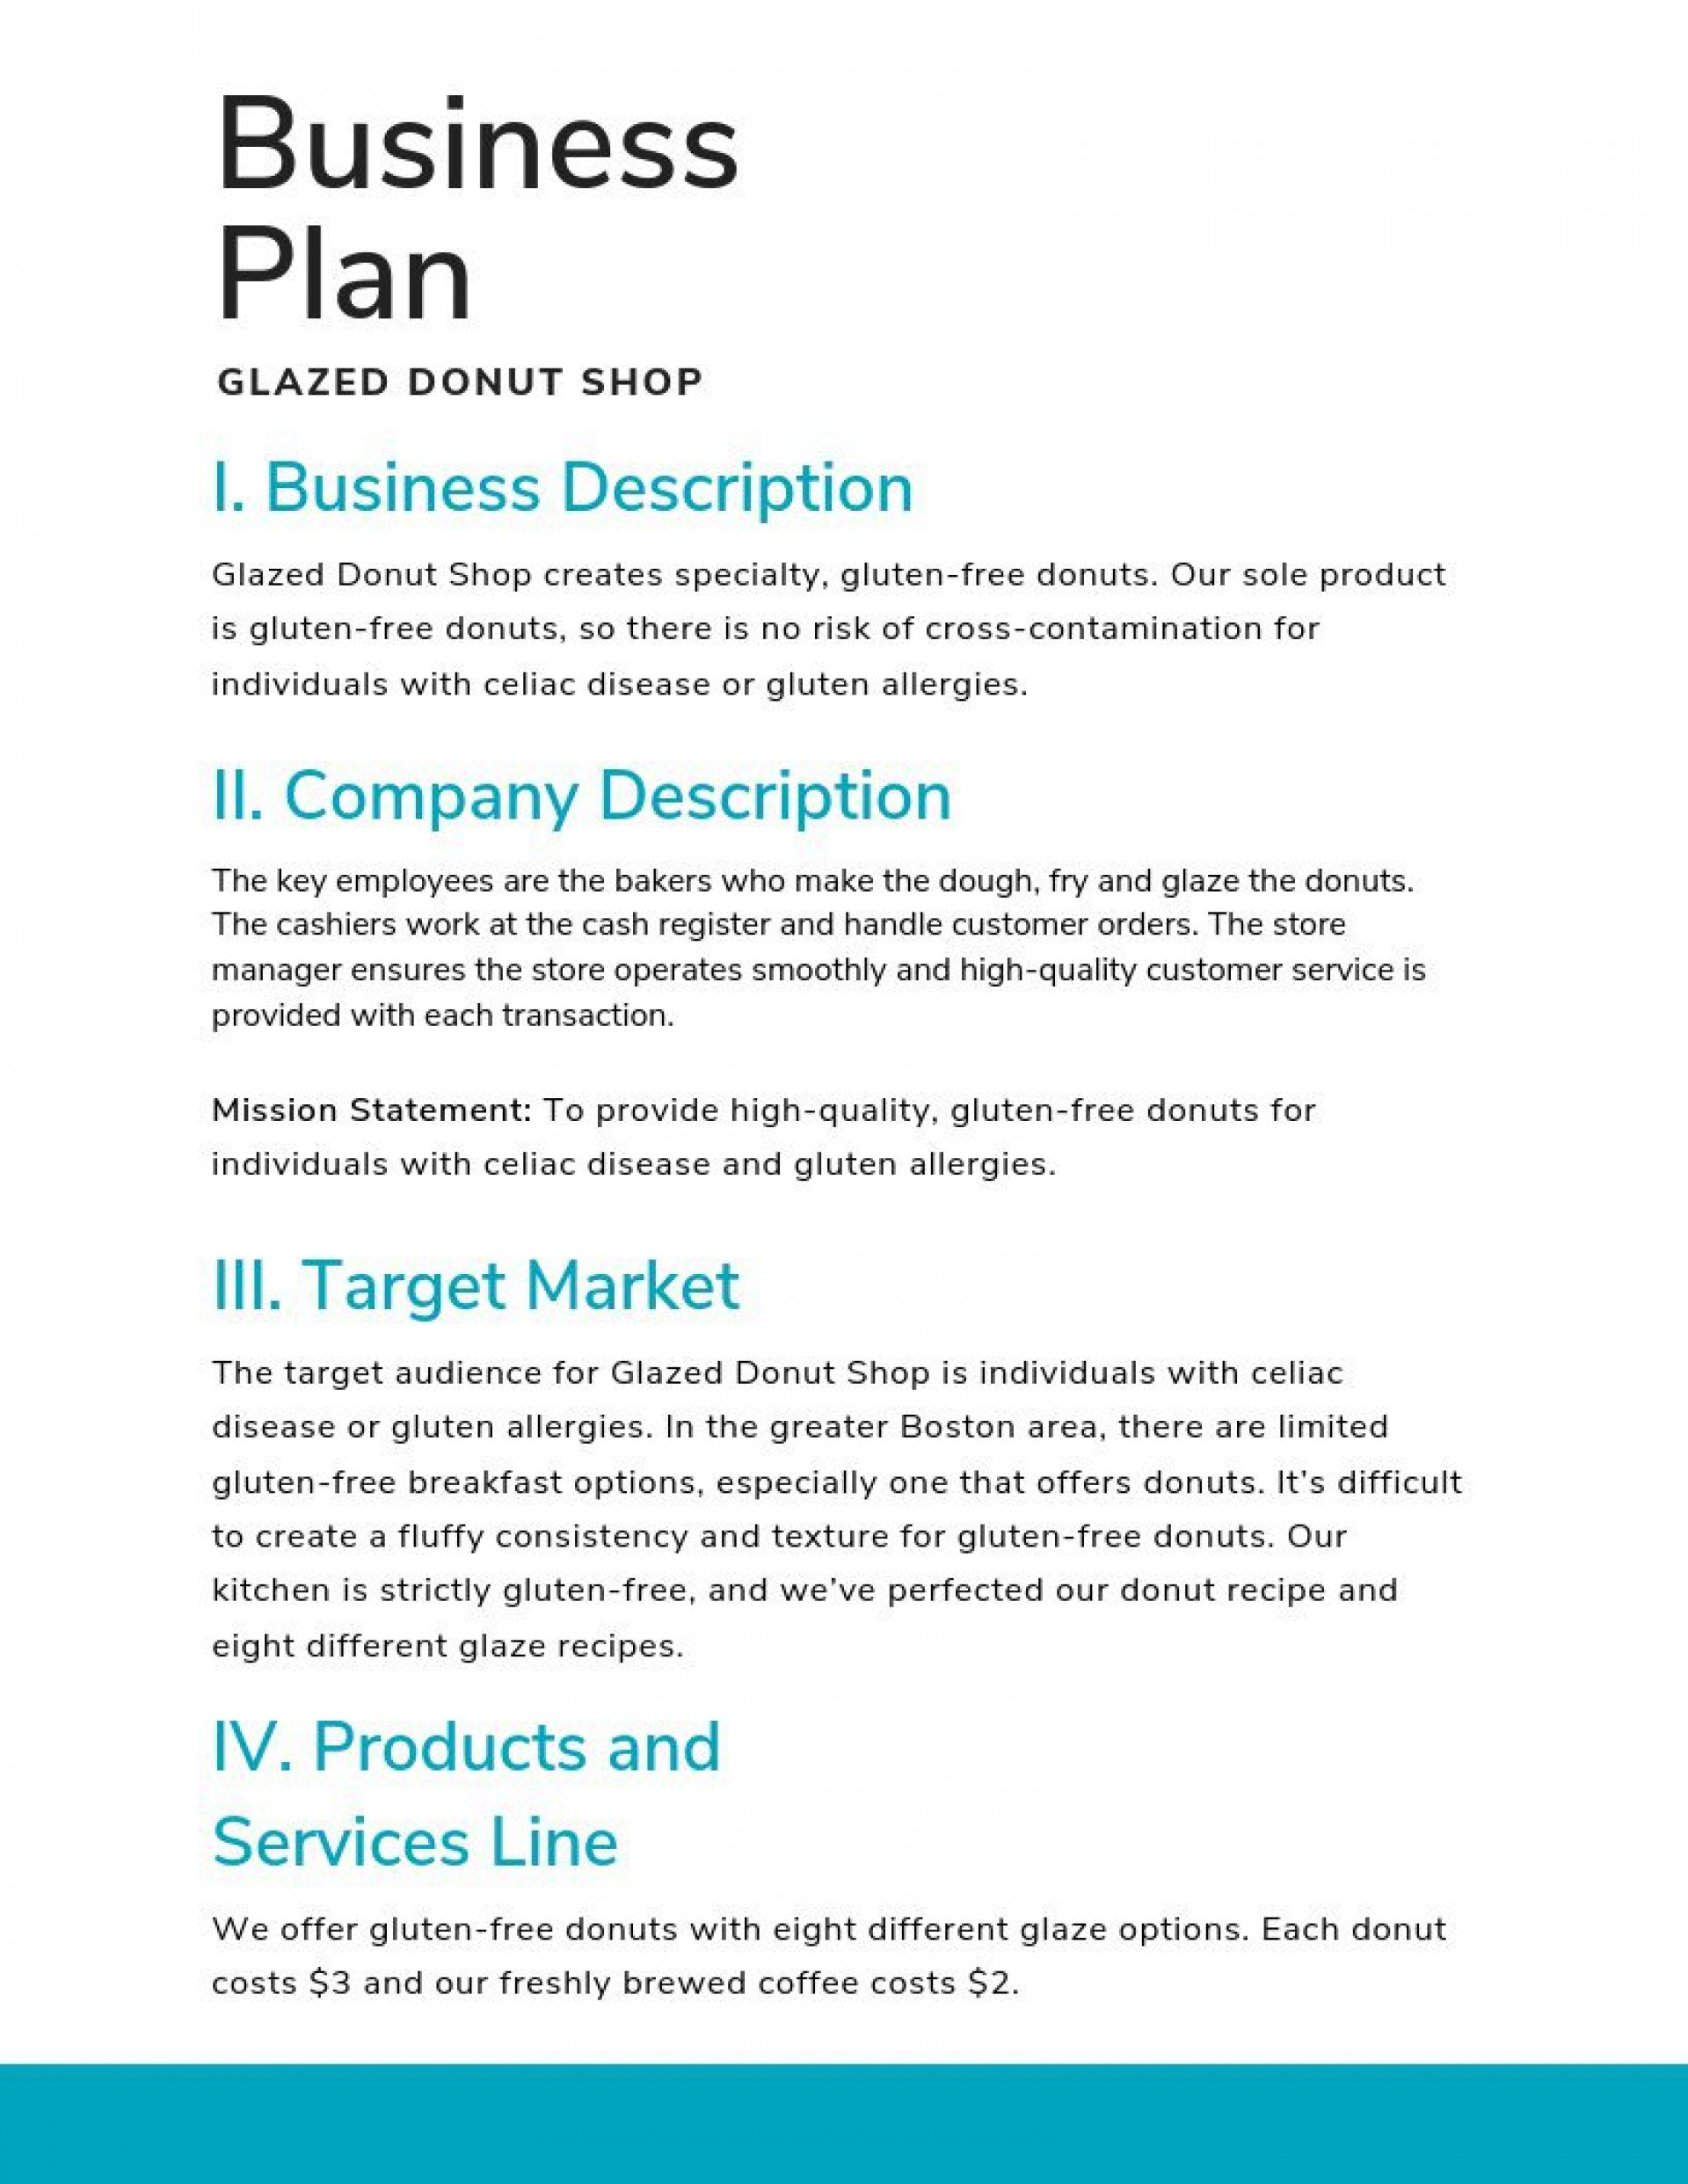 005 Impressive Startup Busines Plan Template High Resolution  Free Download Doc1920